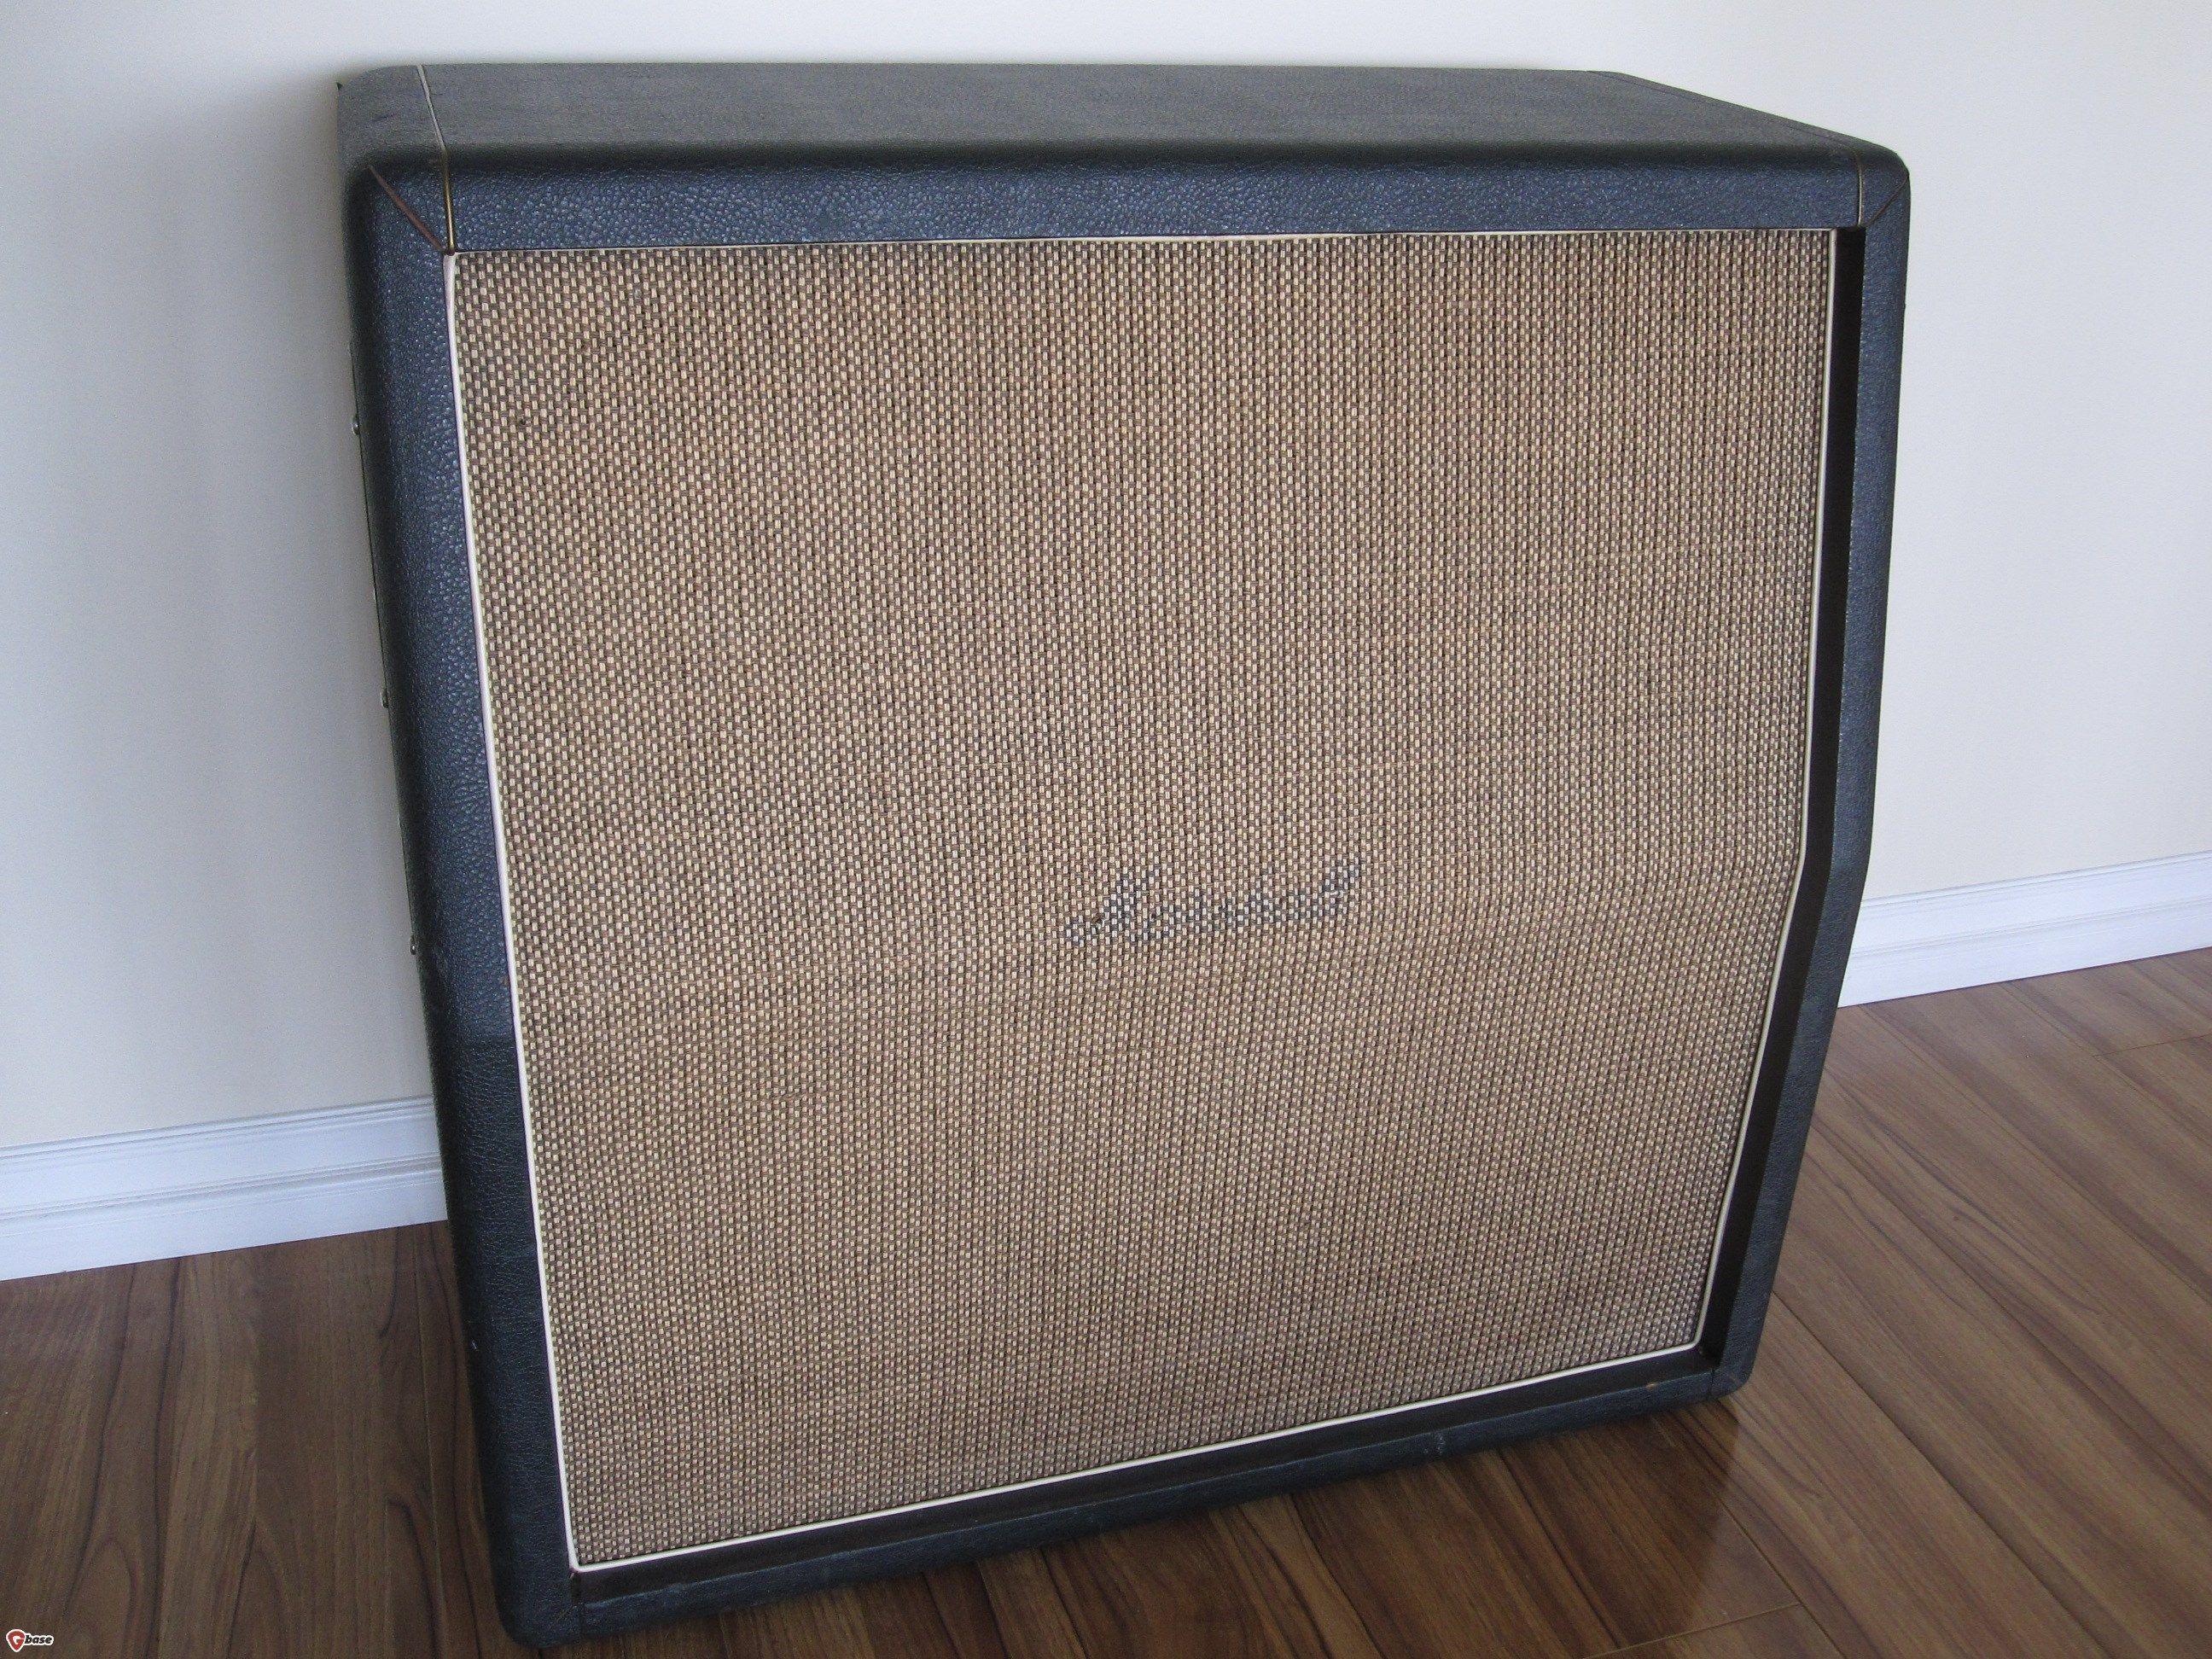 Marshall 4x10 Cabinet 1969 Vintage Marshall 4x12 1960a Celestion Plexi Cabinet Speaker